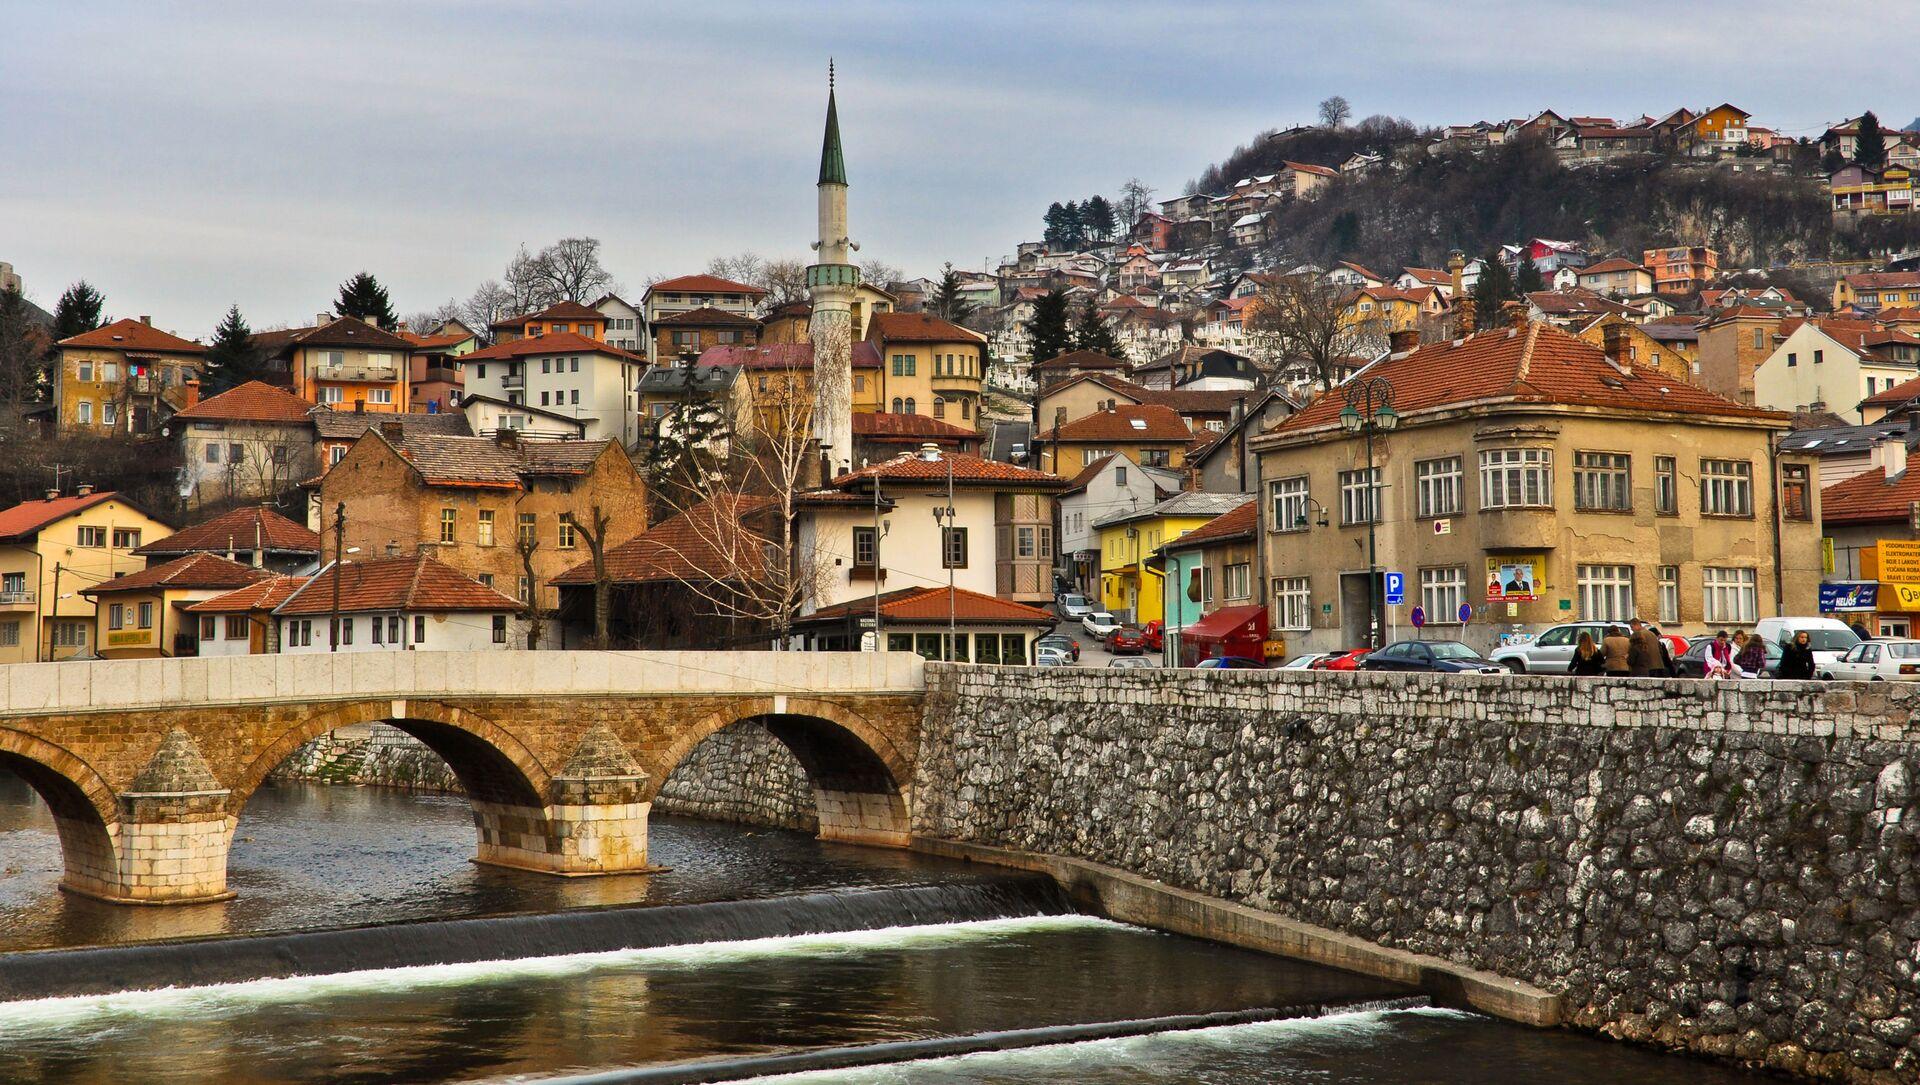 Widok na stare miasto w Sarajewie, Bośnia i Hercegowina - Sputnik Polska, 1920, 17.03.2021